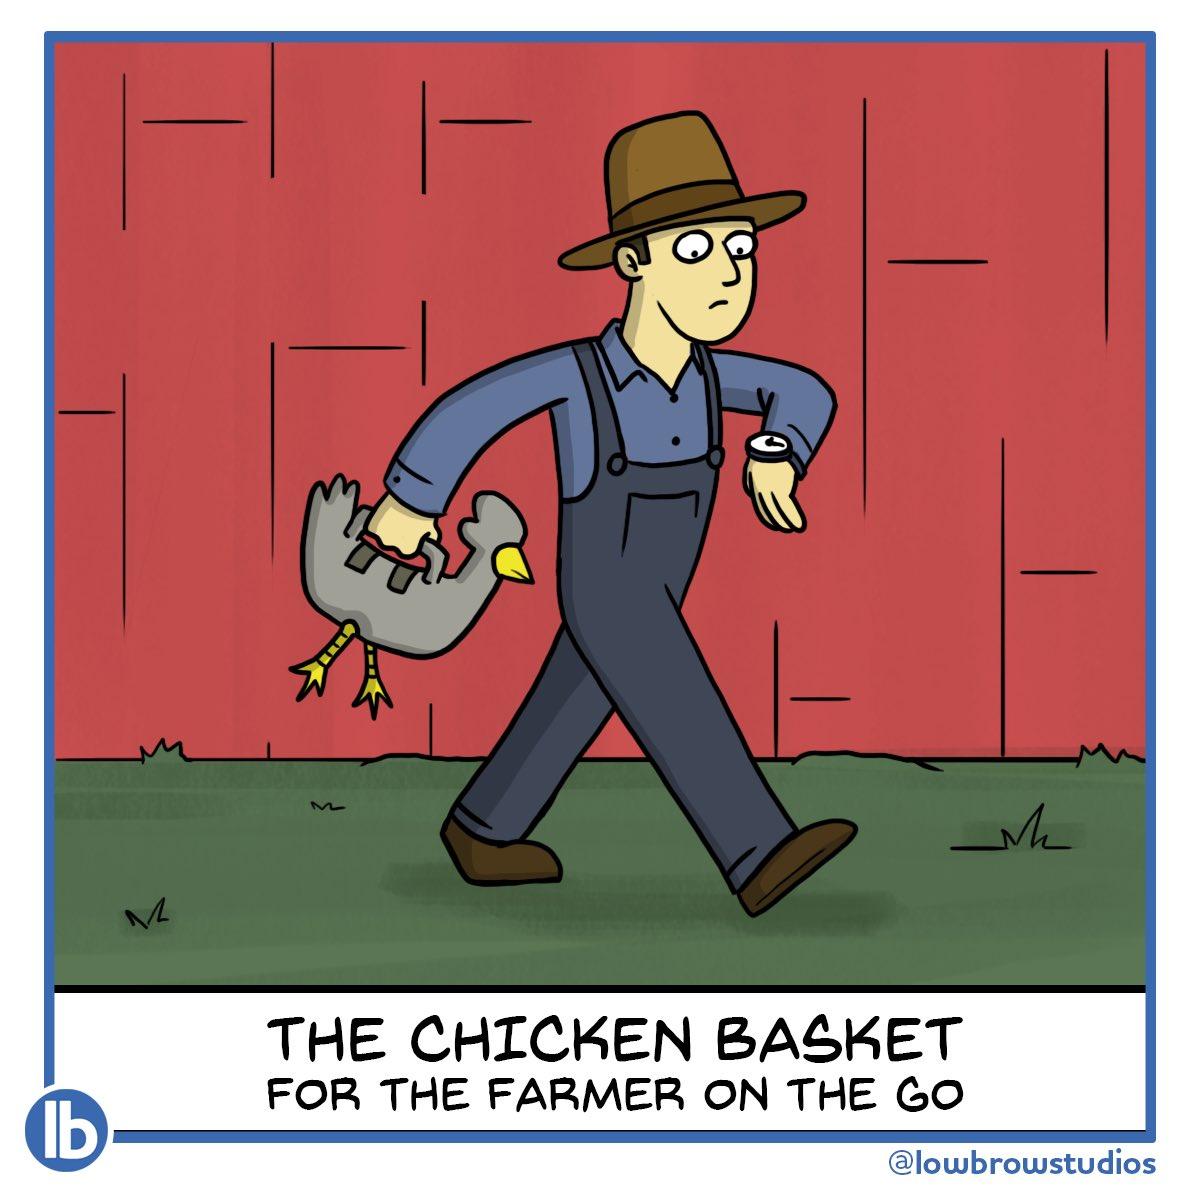 Time is money.  #comics #webcomics #webcomic #illustration #drawingpic.twitter.com/bQhstmmpC5